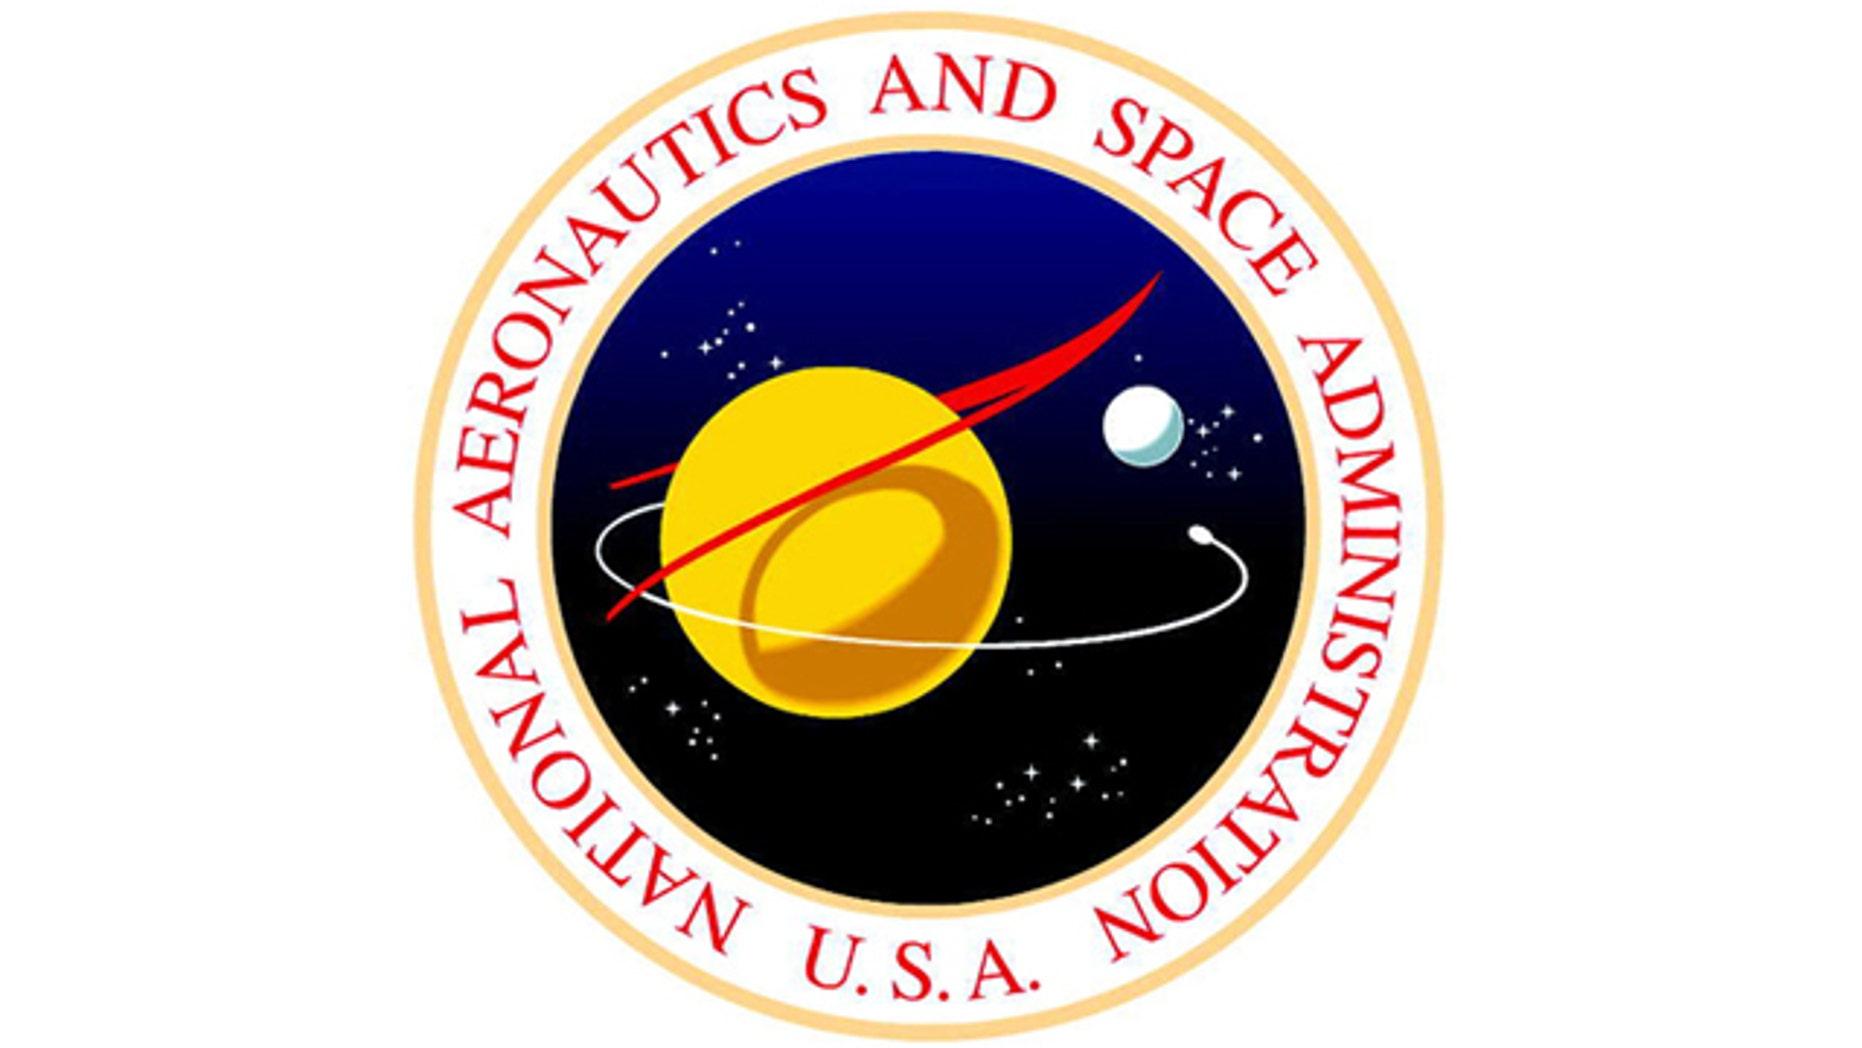 A vintage logo for NASA, the National Aeronautics and Space Administration.